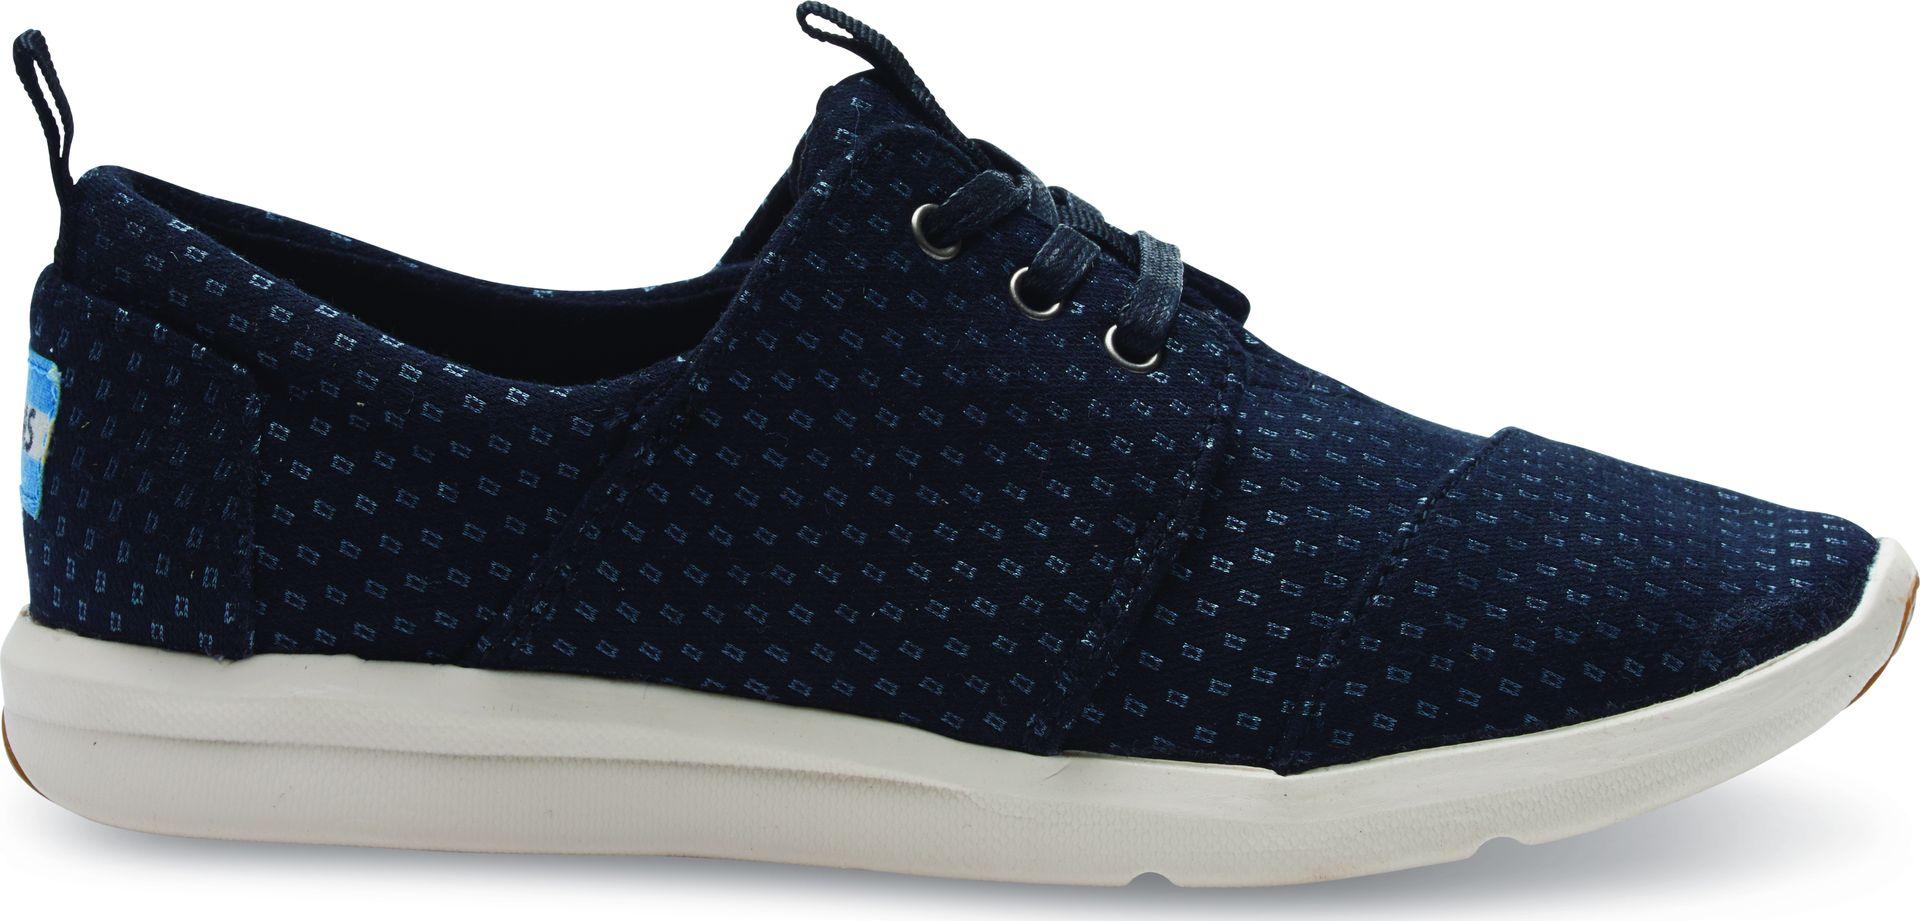 TOMS Textile Women's Del Rey Sneaker Black/Silver 37